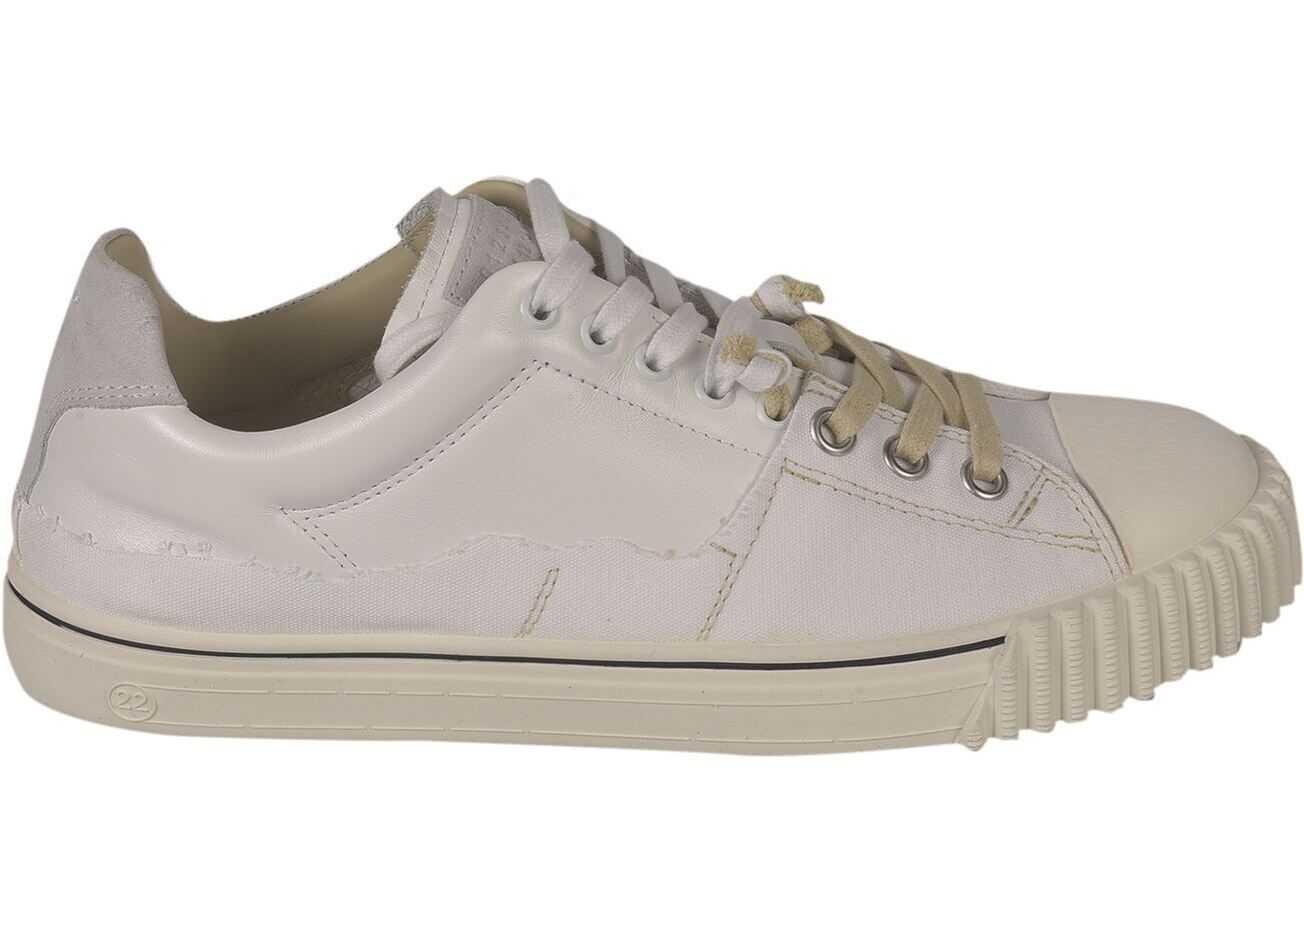 Maison Margiela Evolution Sneakers In White S57WS0391P4022H8548 White imagine b-mall.ro